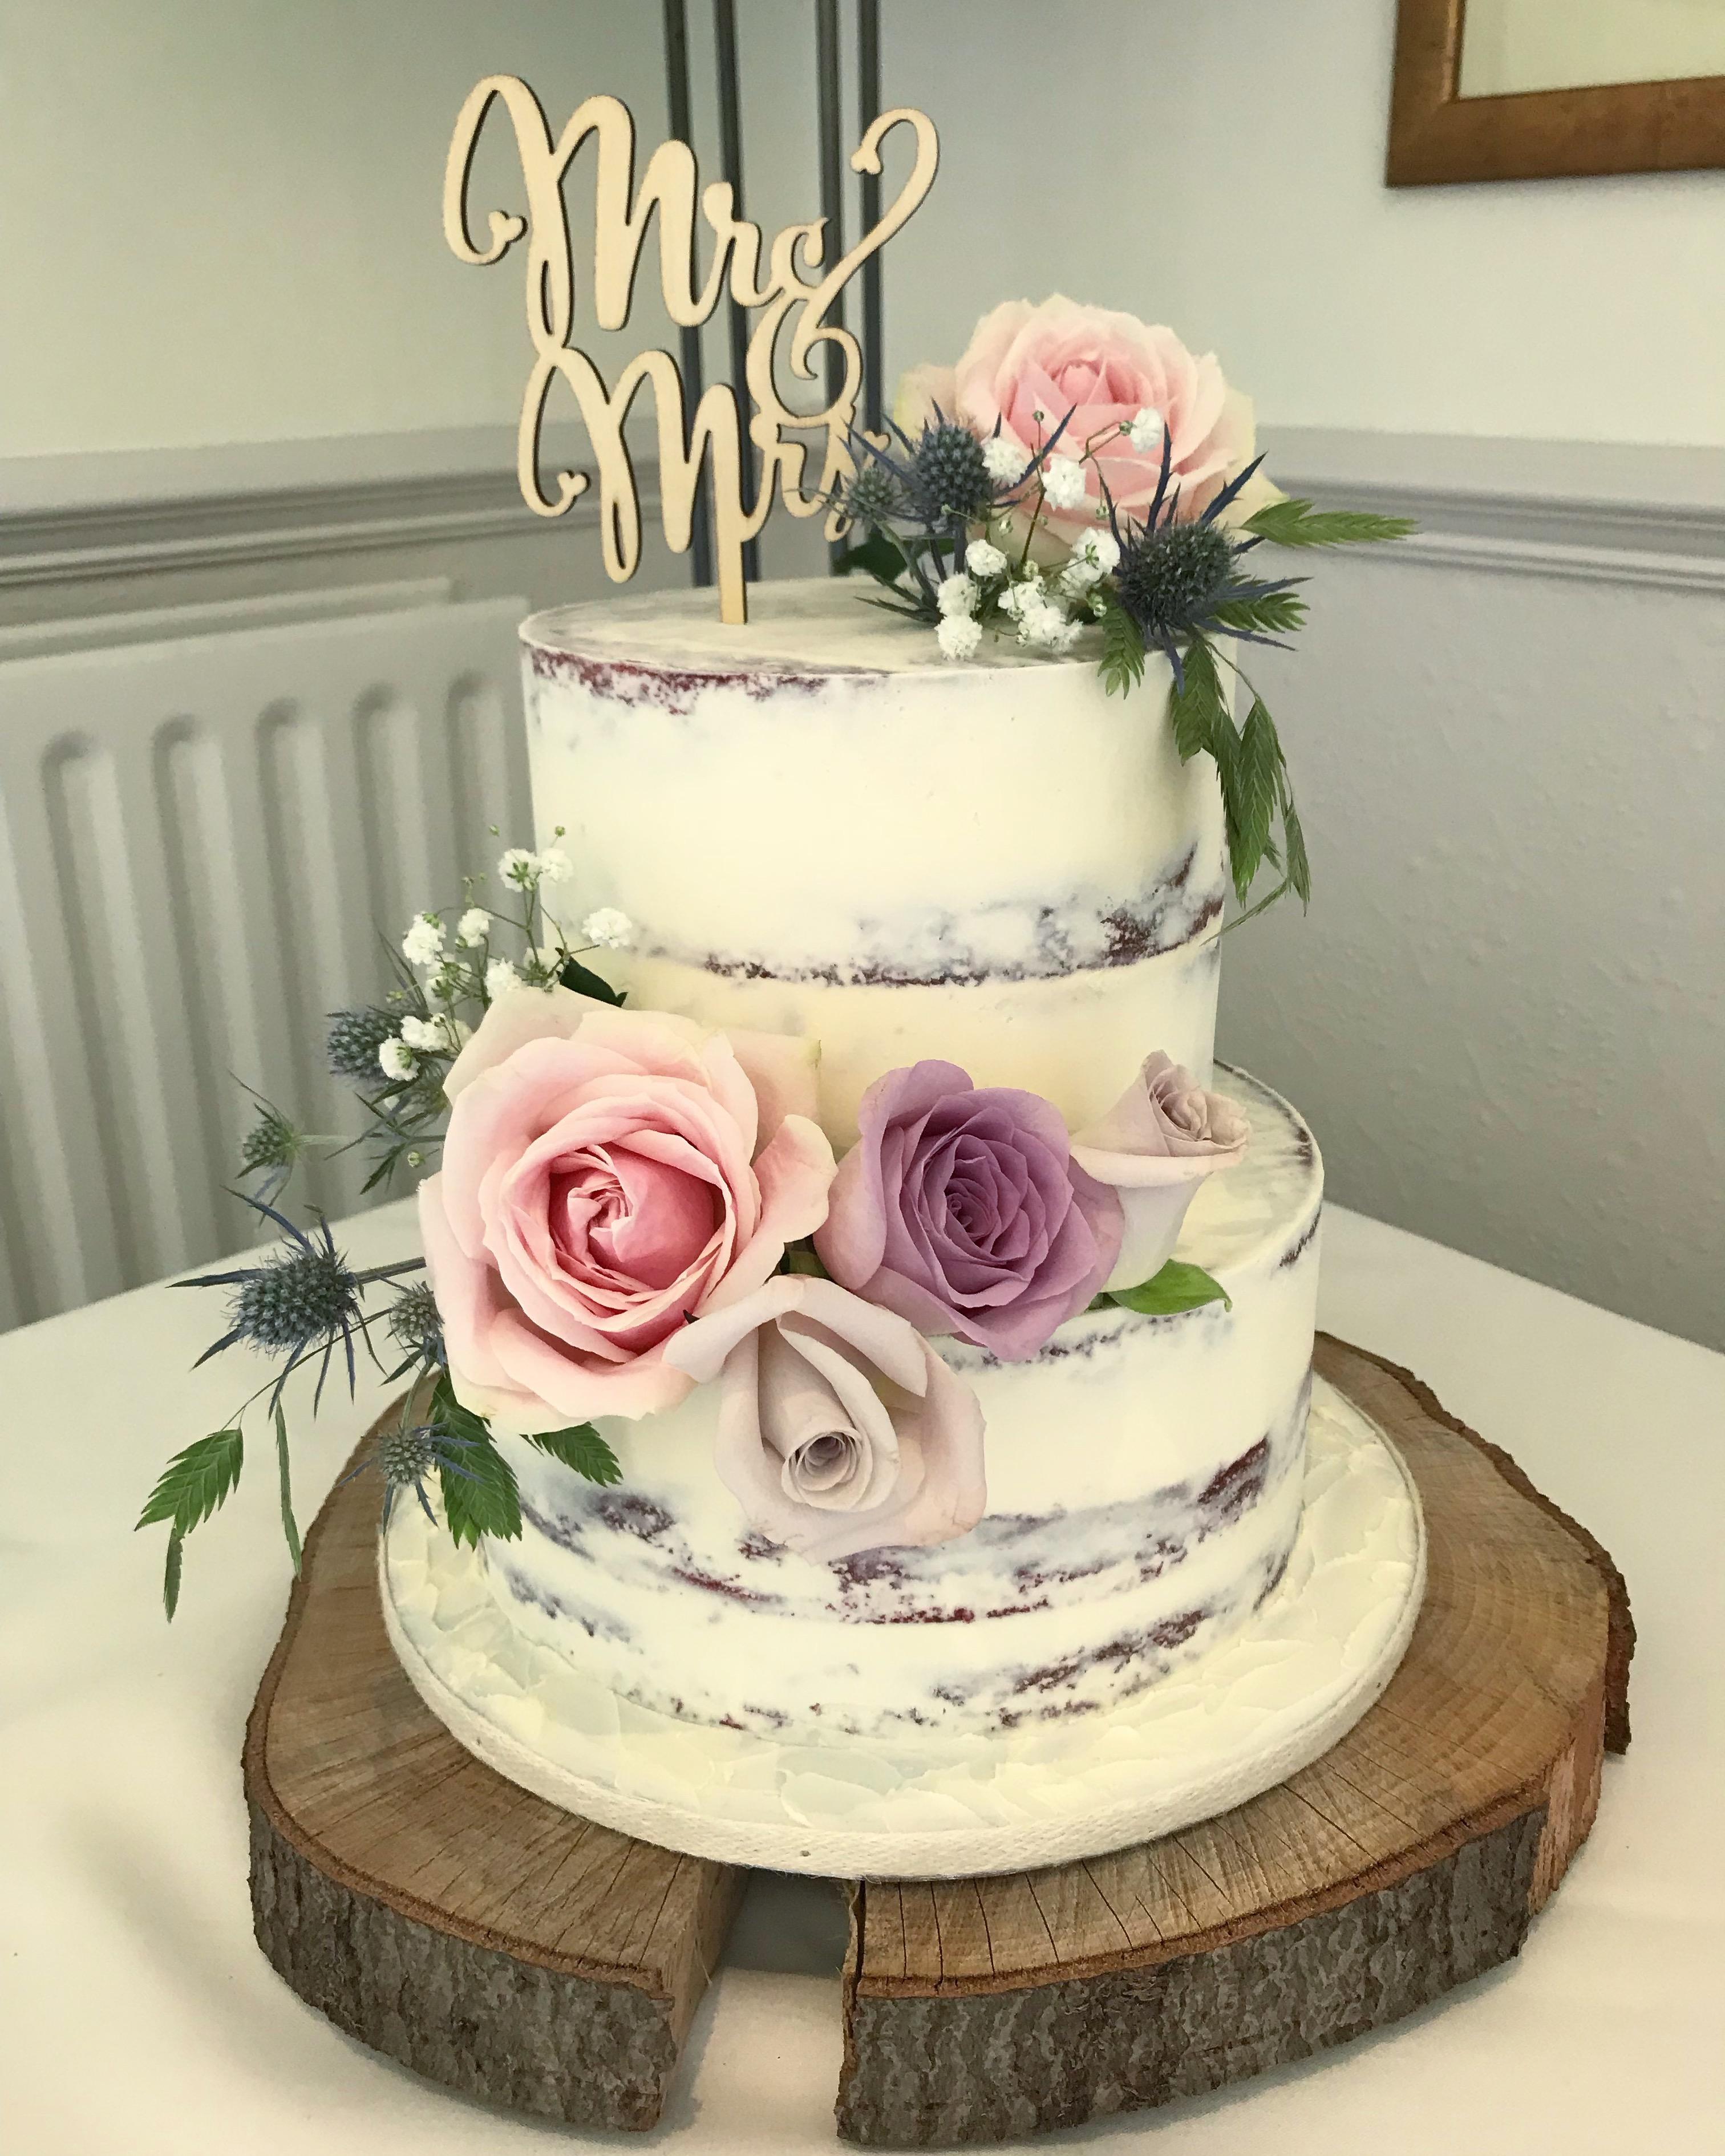 Wedding Cakes in Ashbourne Derbyshire